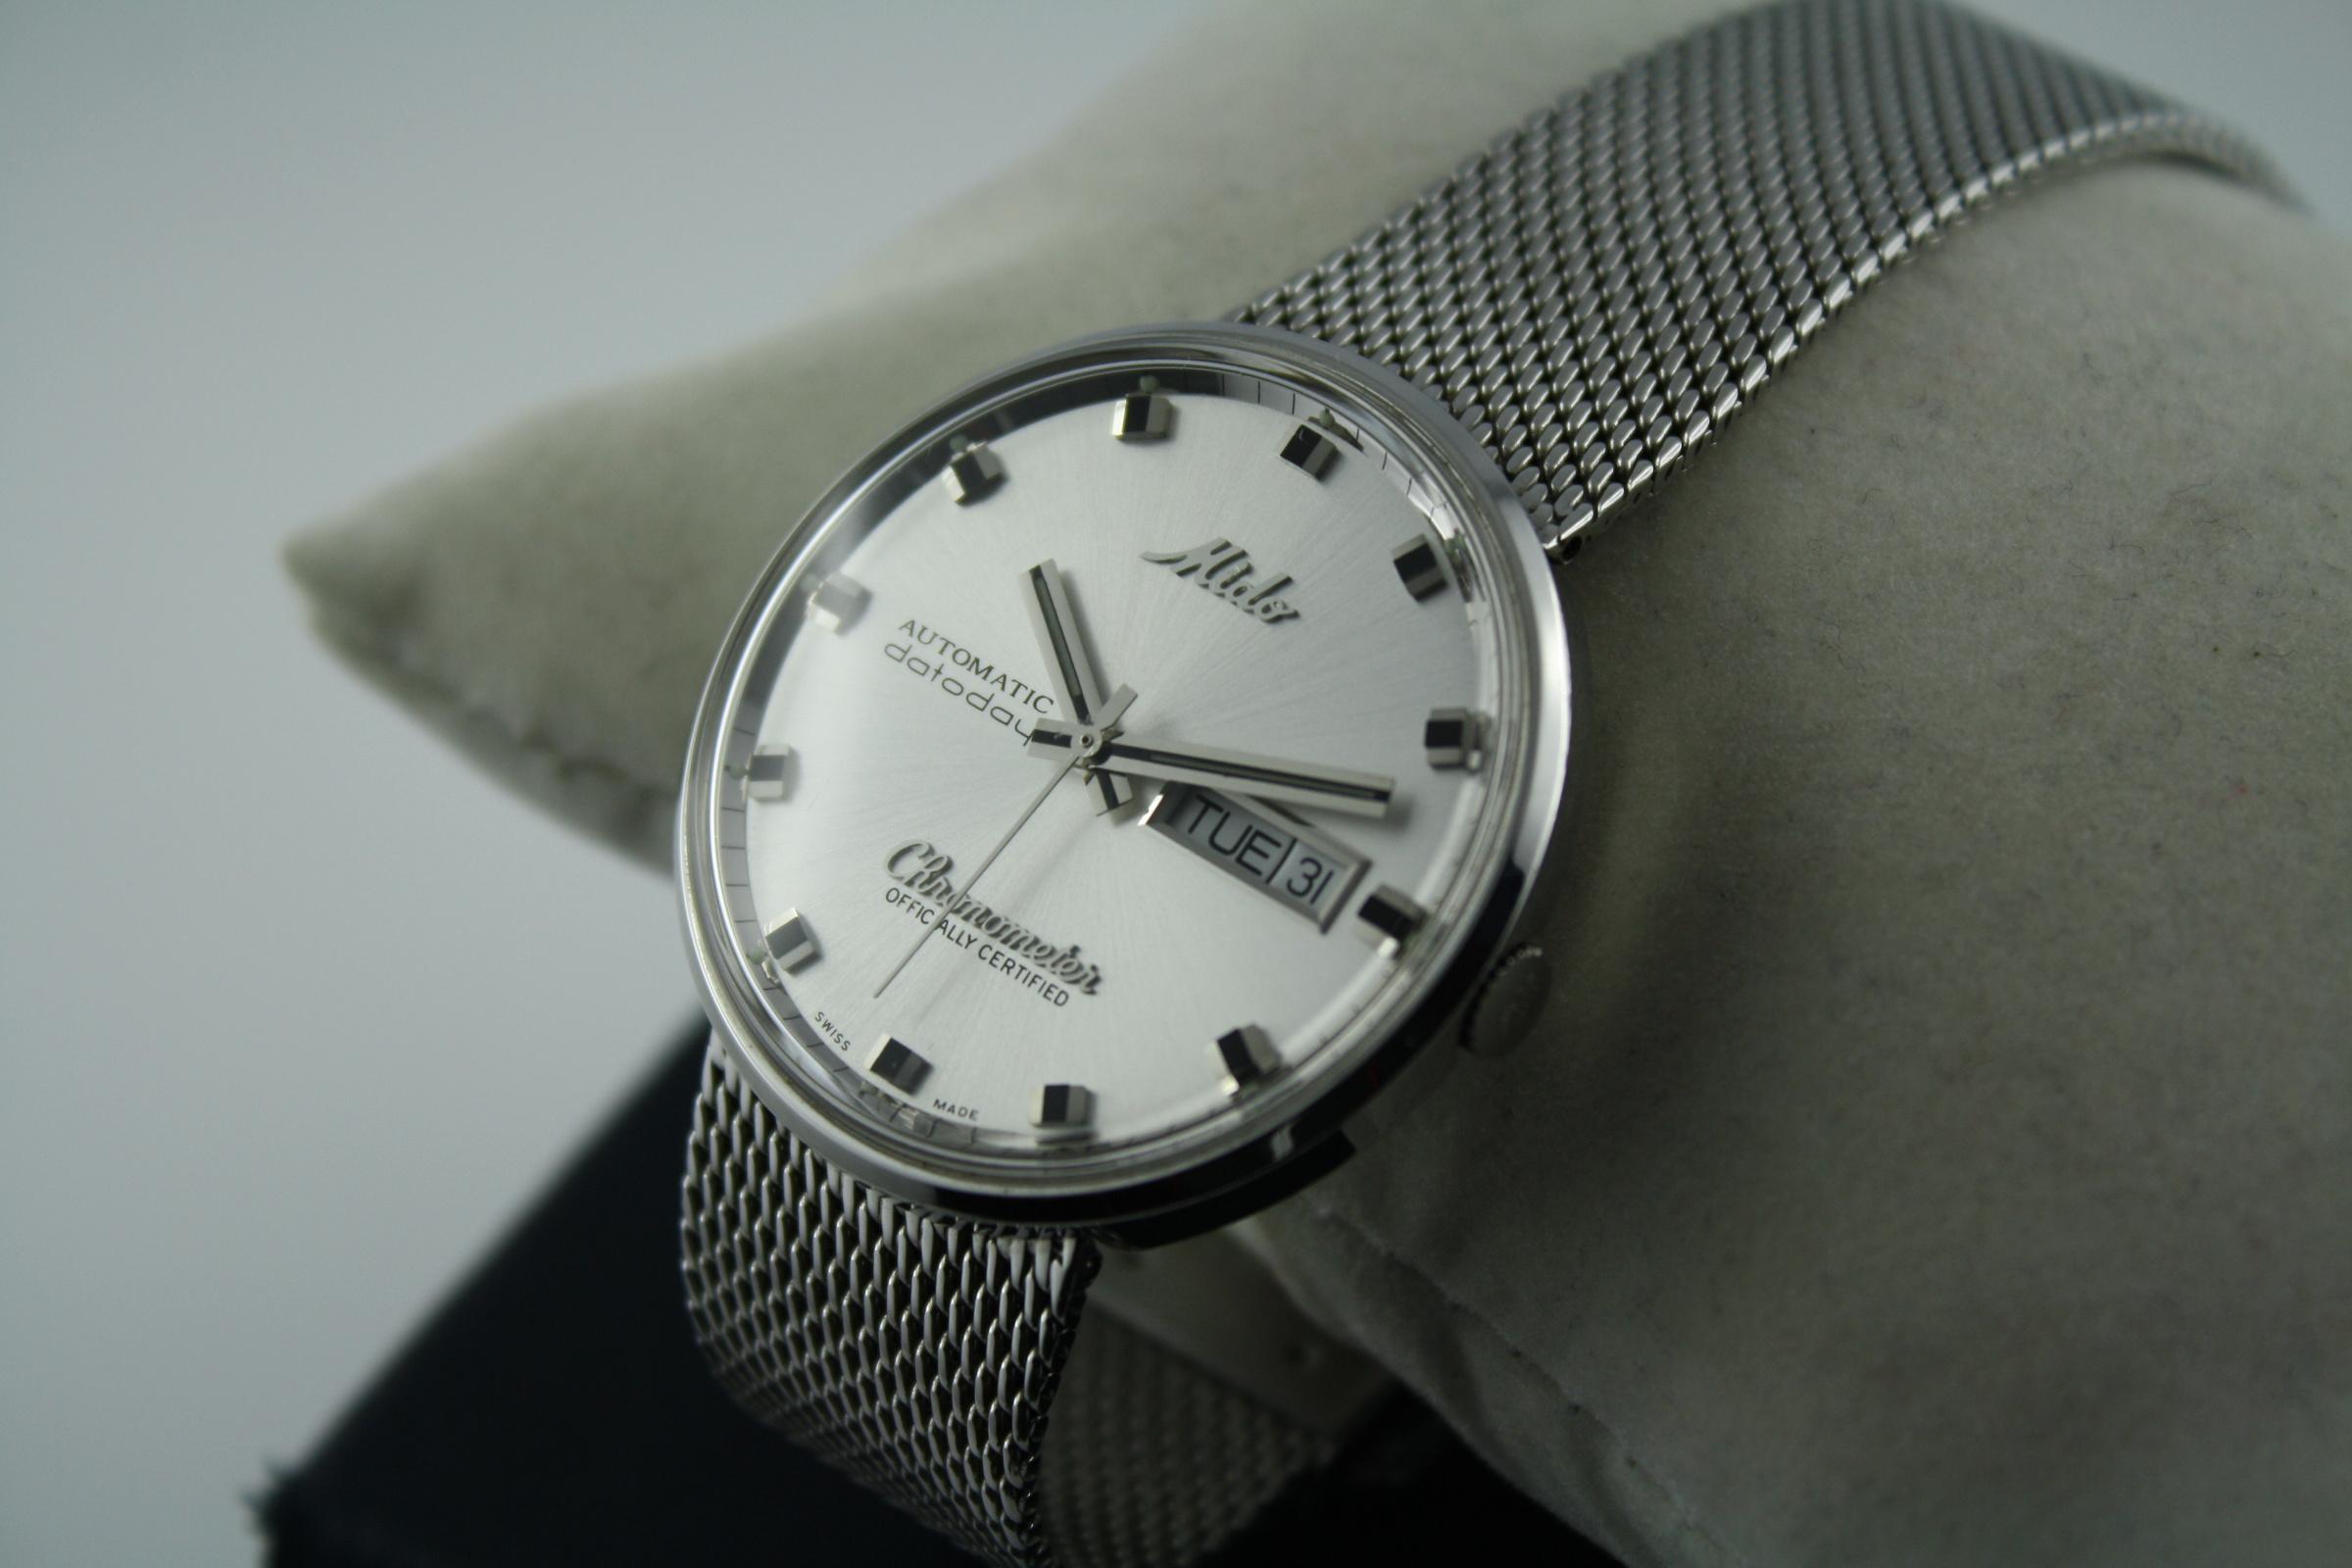 76b4dac89fb Erledigt  - Mido Ocean Star Datoday Commander Chronometer Full Set